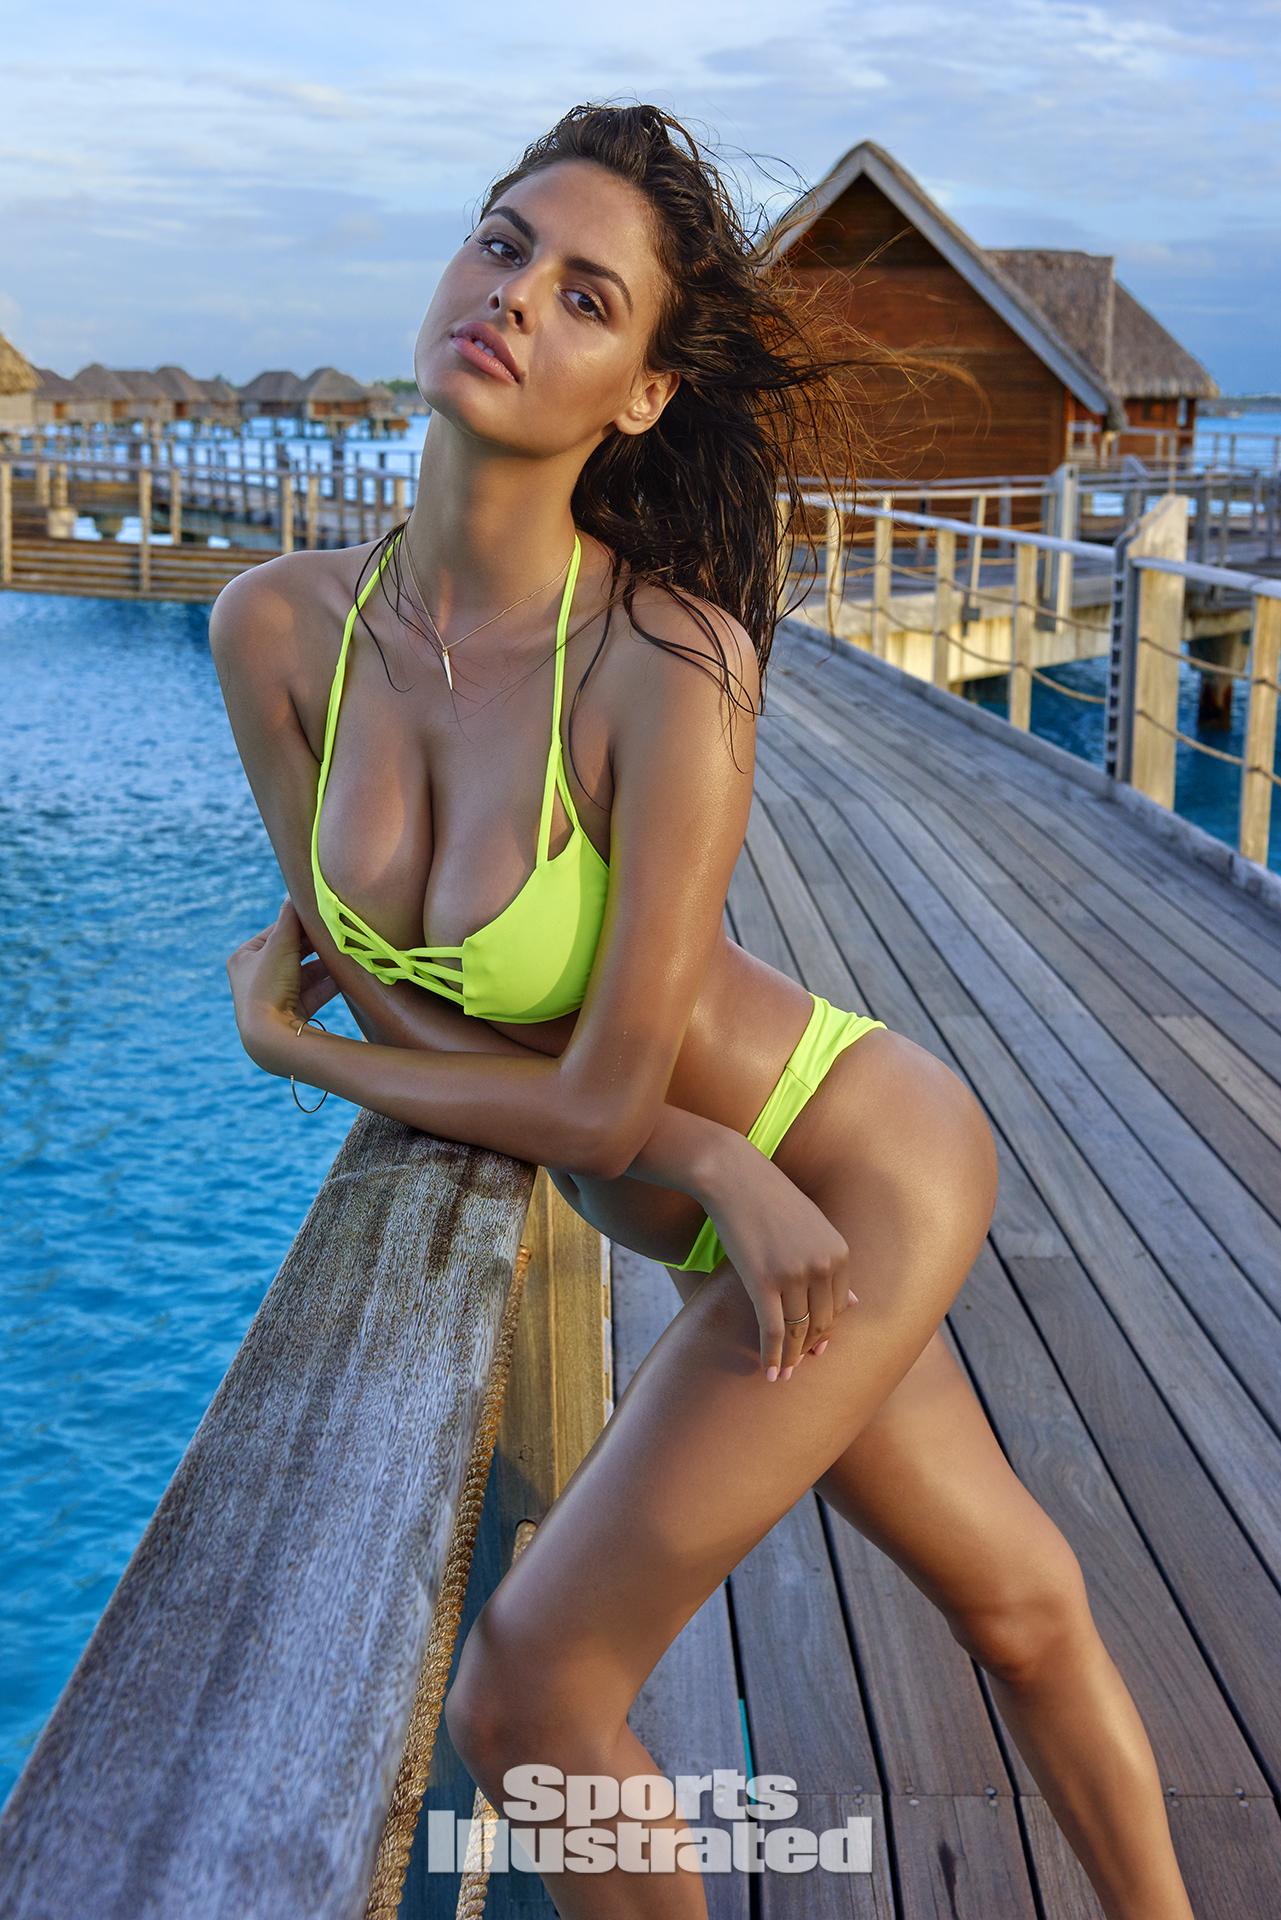 Bo Krsmanovic was photographed by Yu Tsai in The Islands Of Tahiti. Swimsuit by Keva J Swimwear.